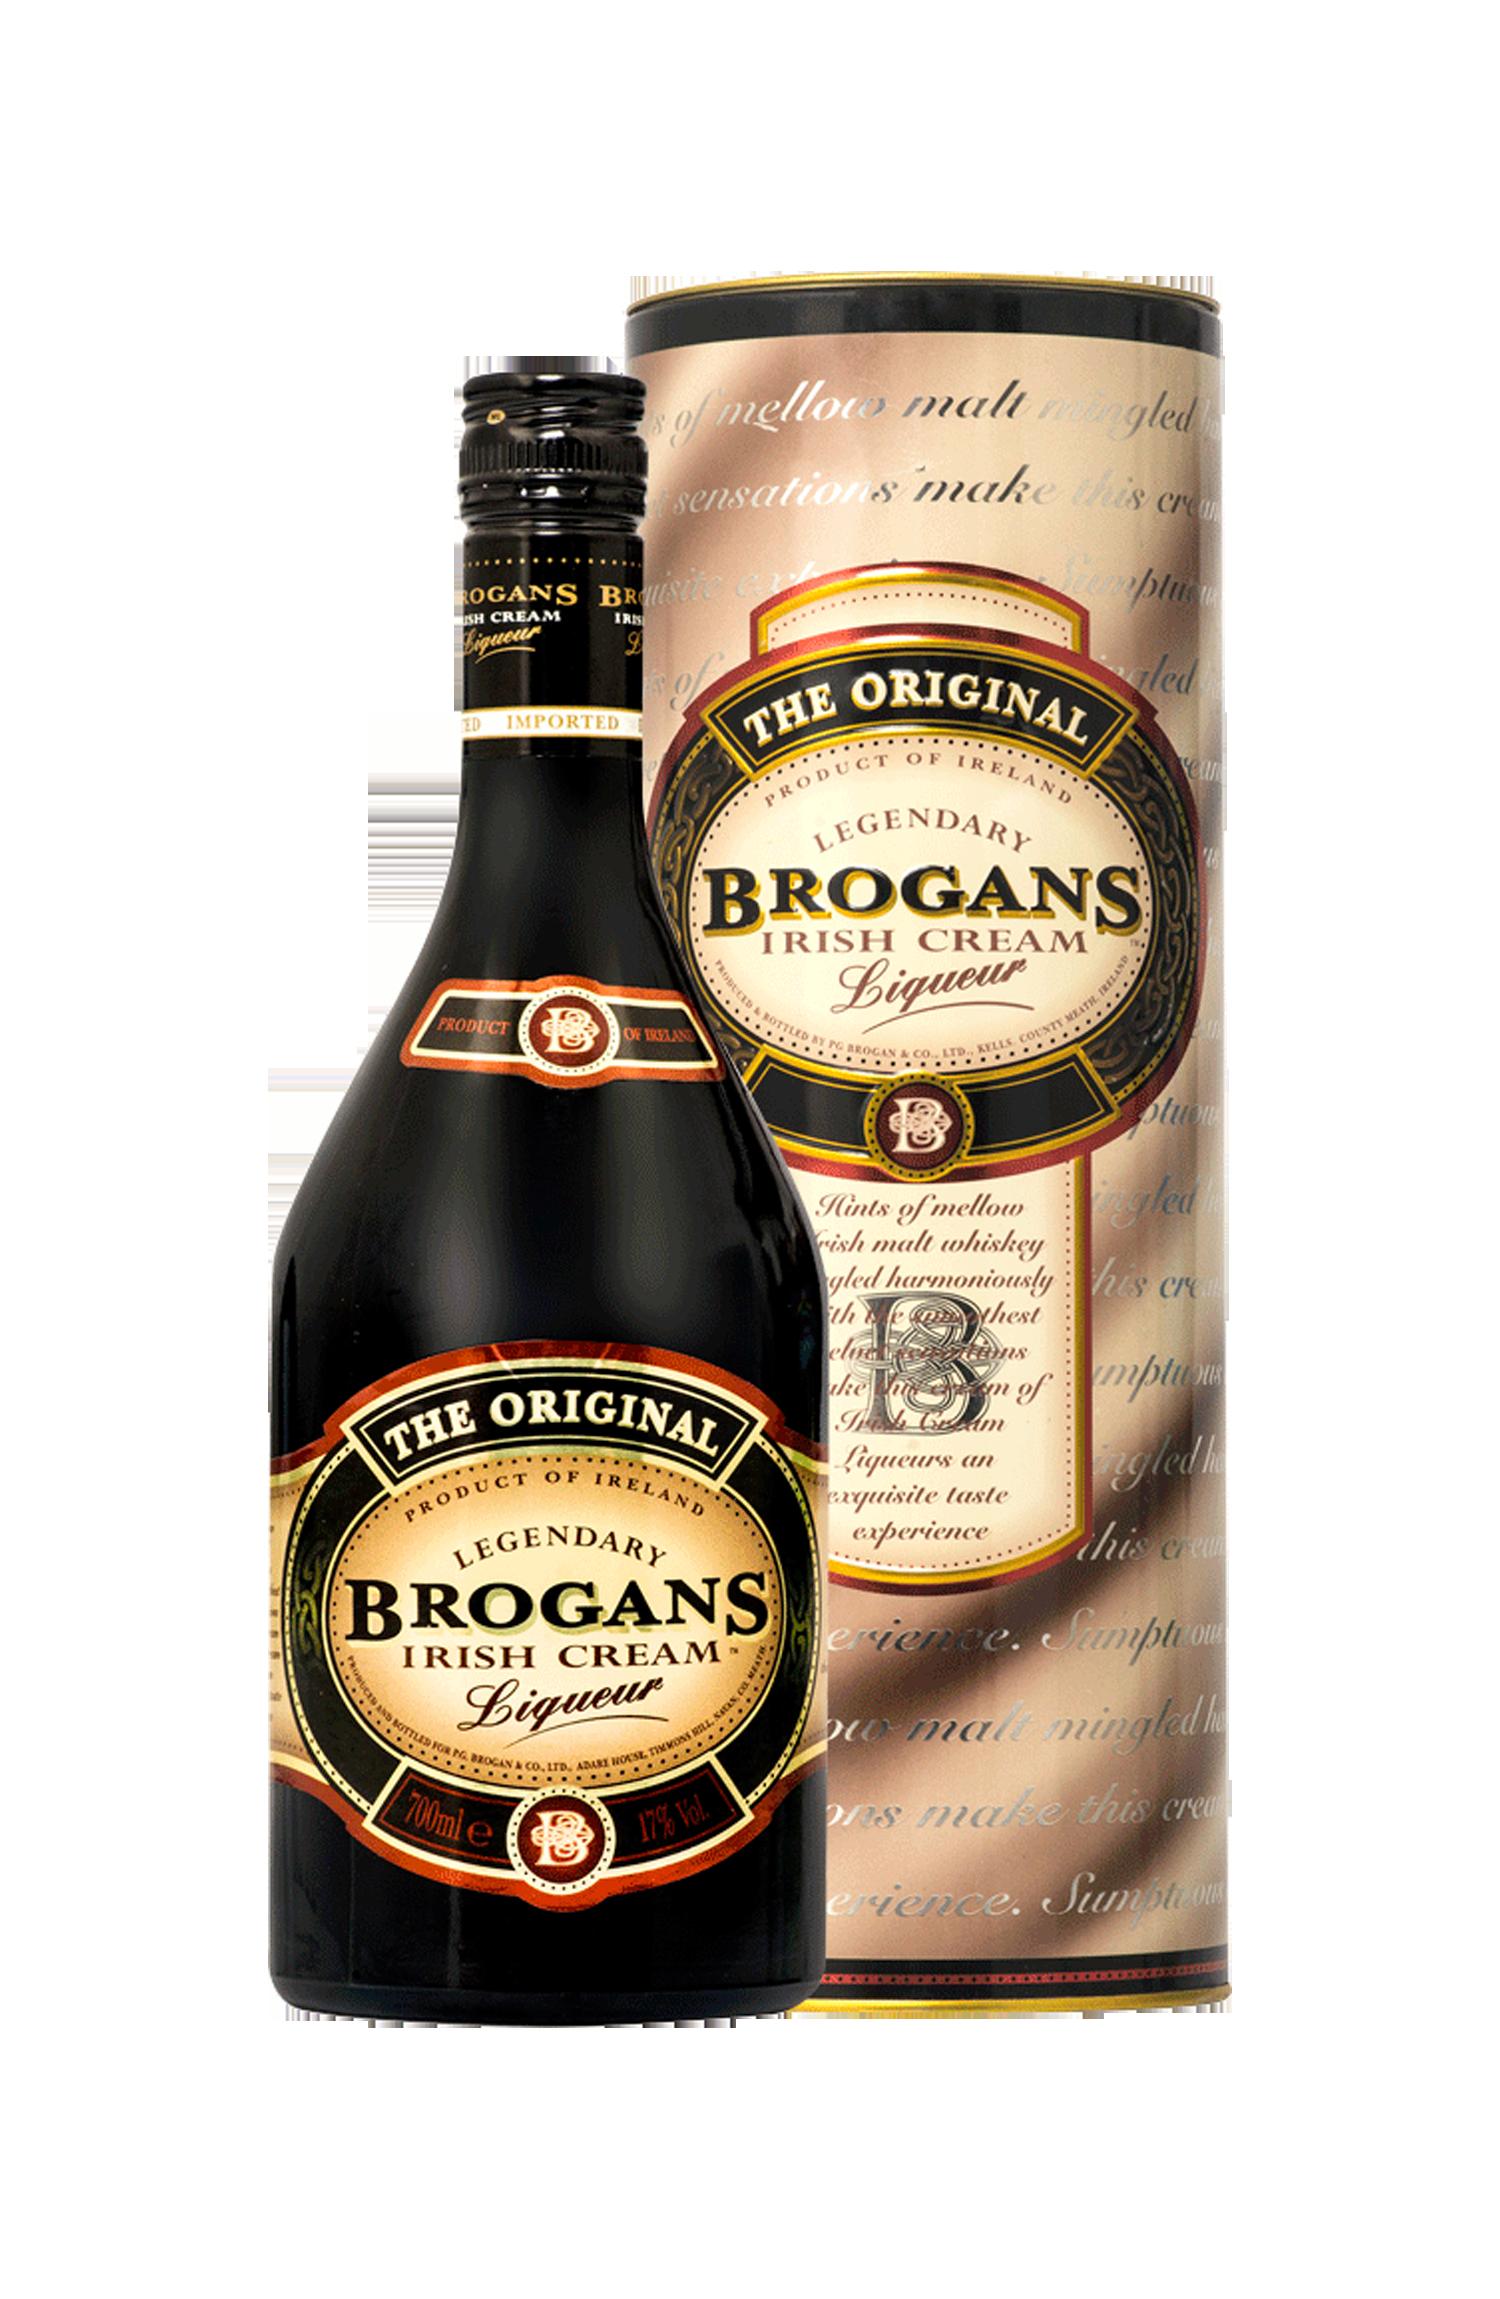 borgans